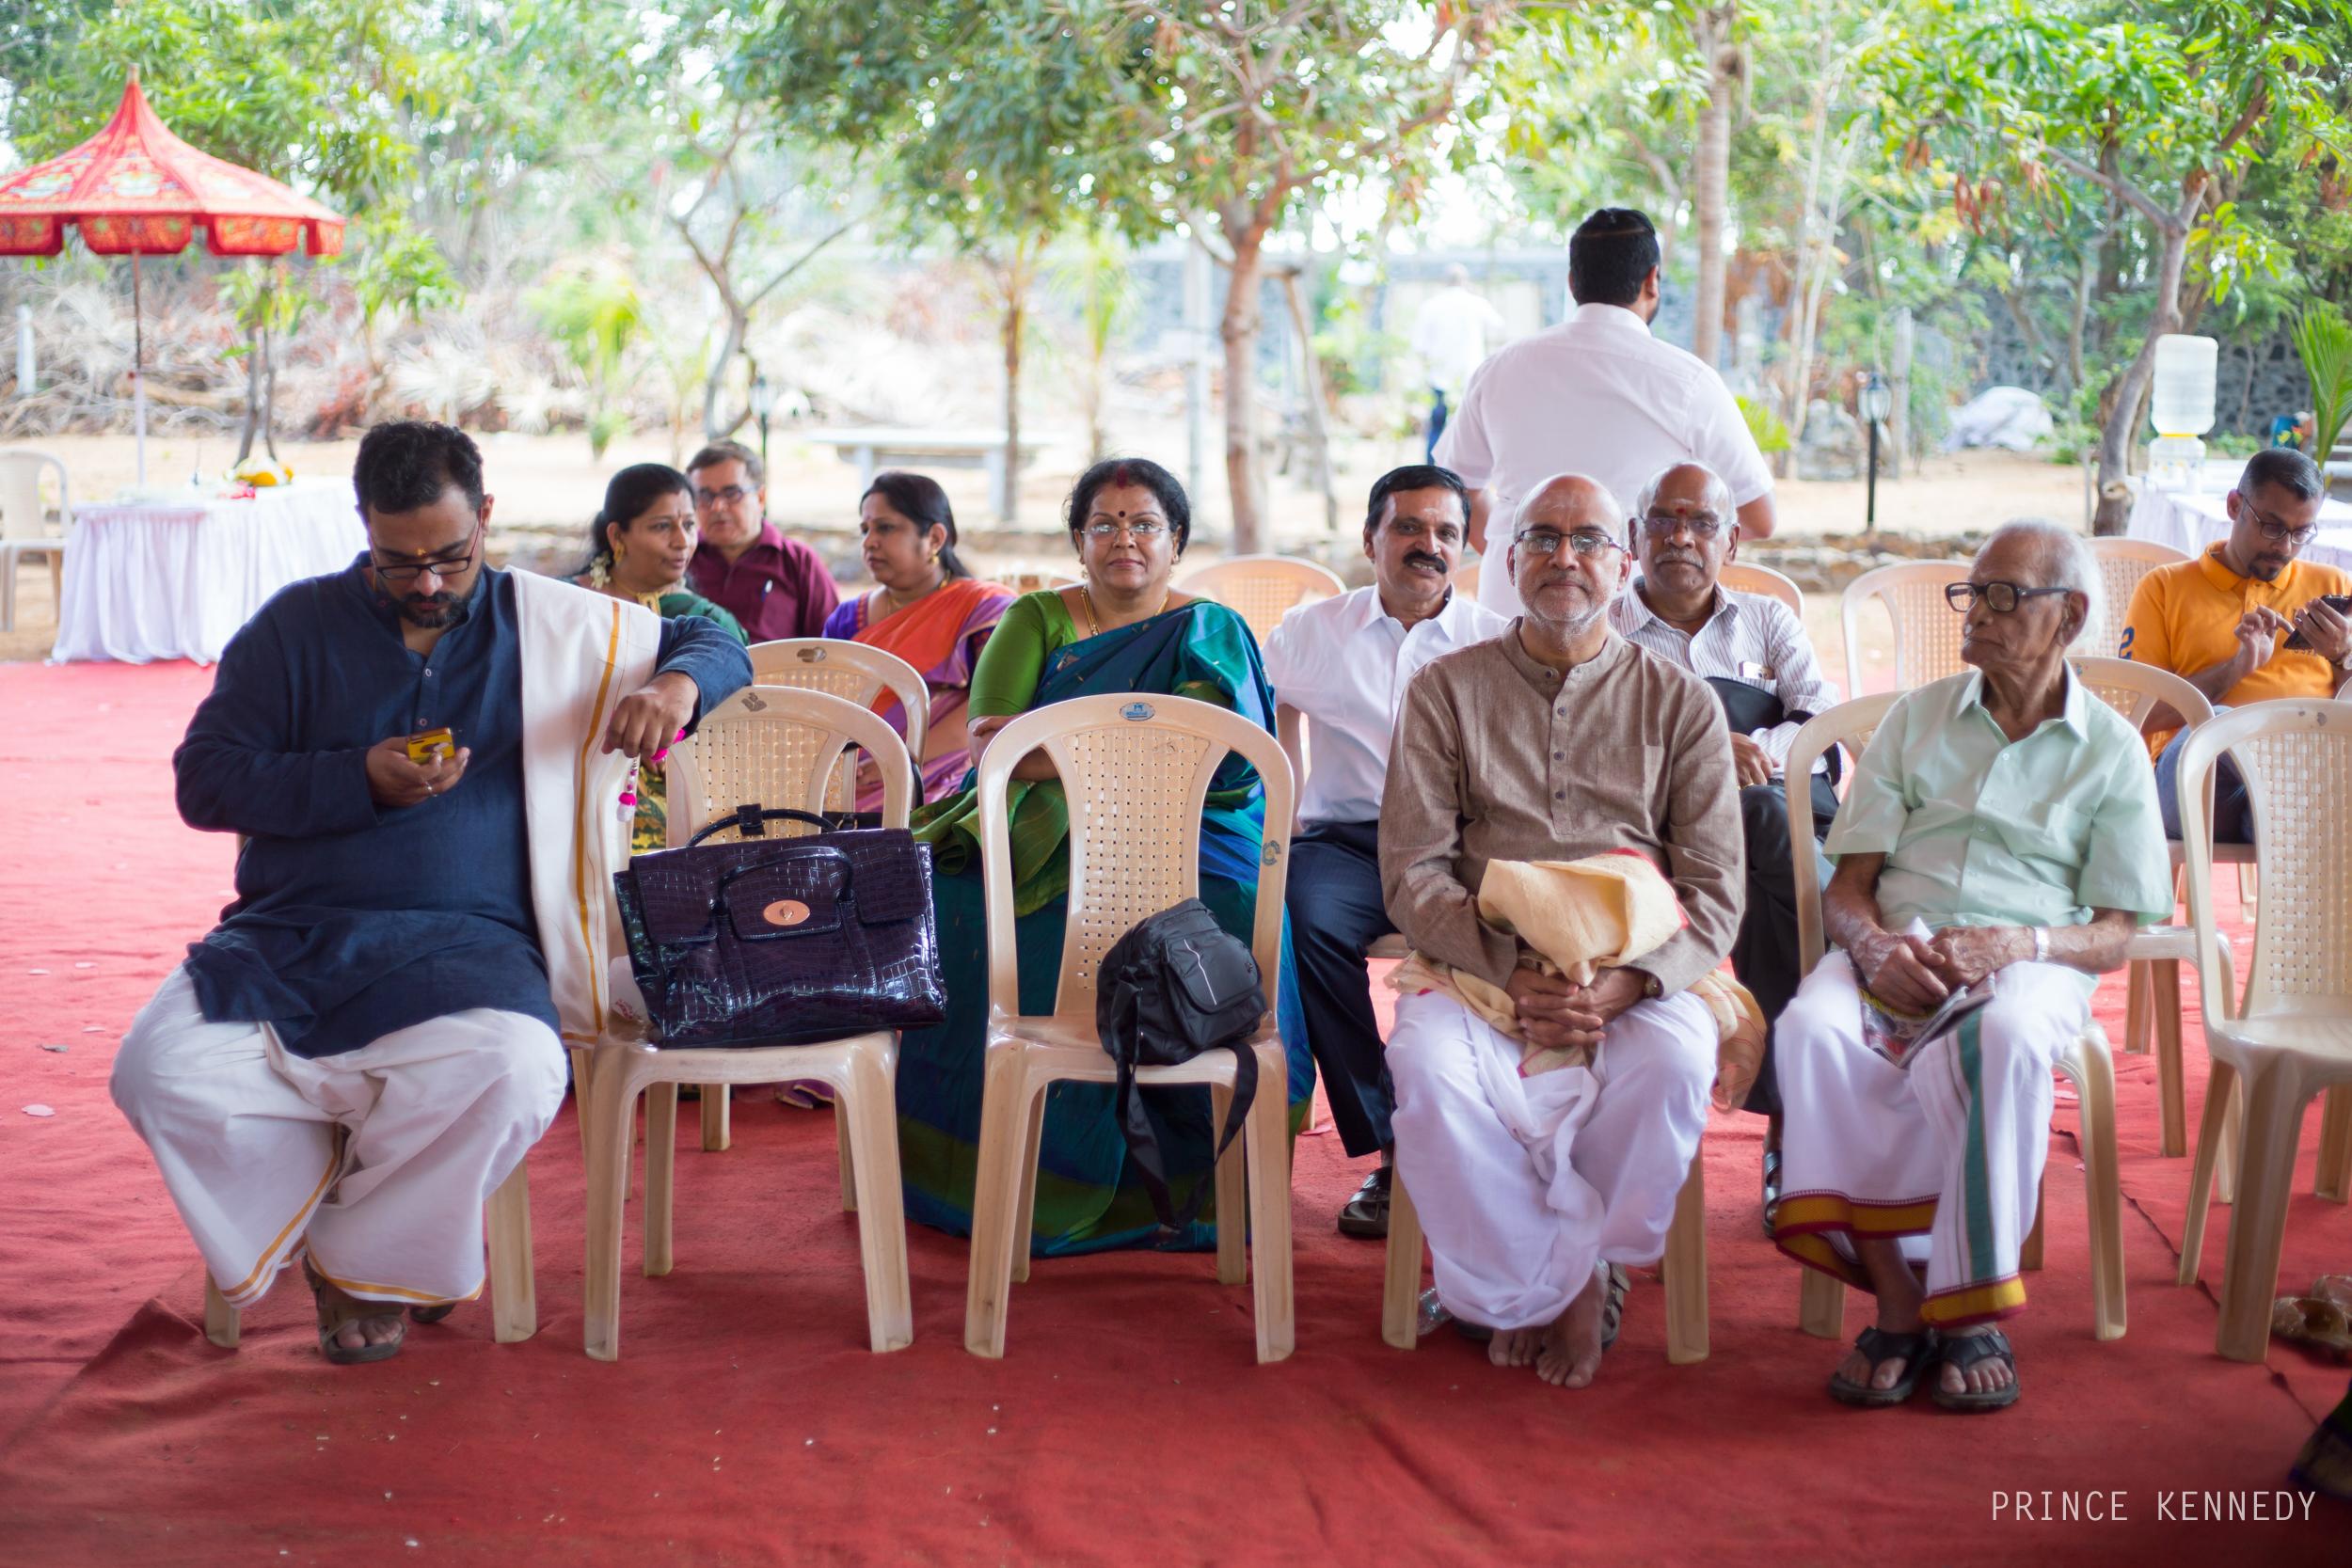 Athmajja-Nithesh-Engagement-Couple-Portrait-Portraiture-Wedding-Couple-Portrait-Chennai-Photographer-Candid-Photography-Destination-Best-Prince-Kennedy-Photography-25.jpg